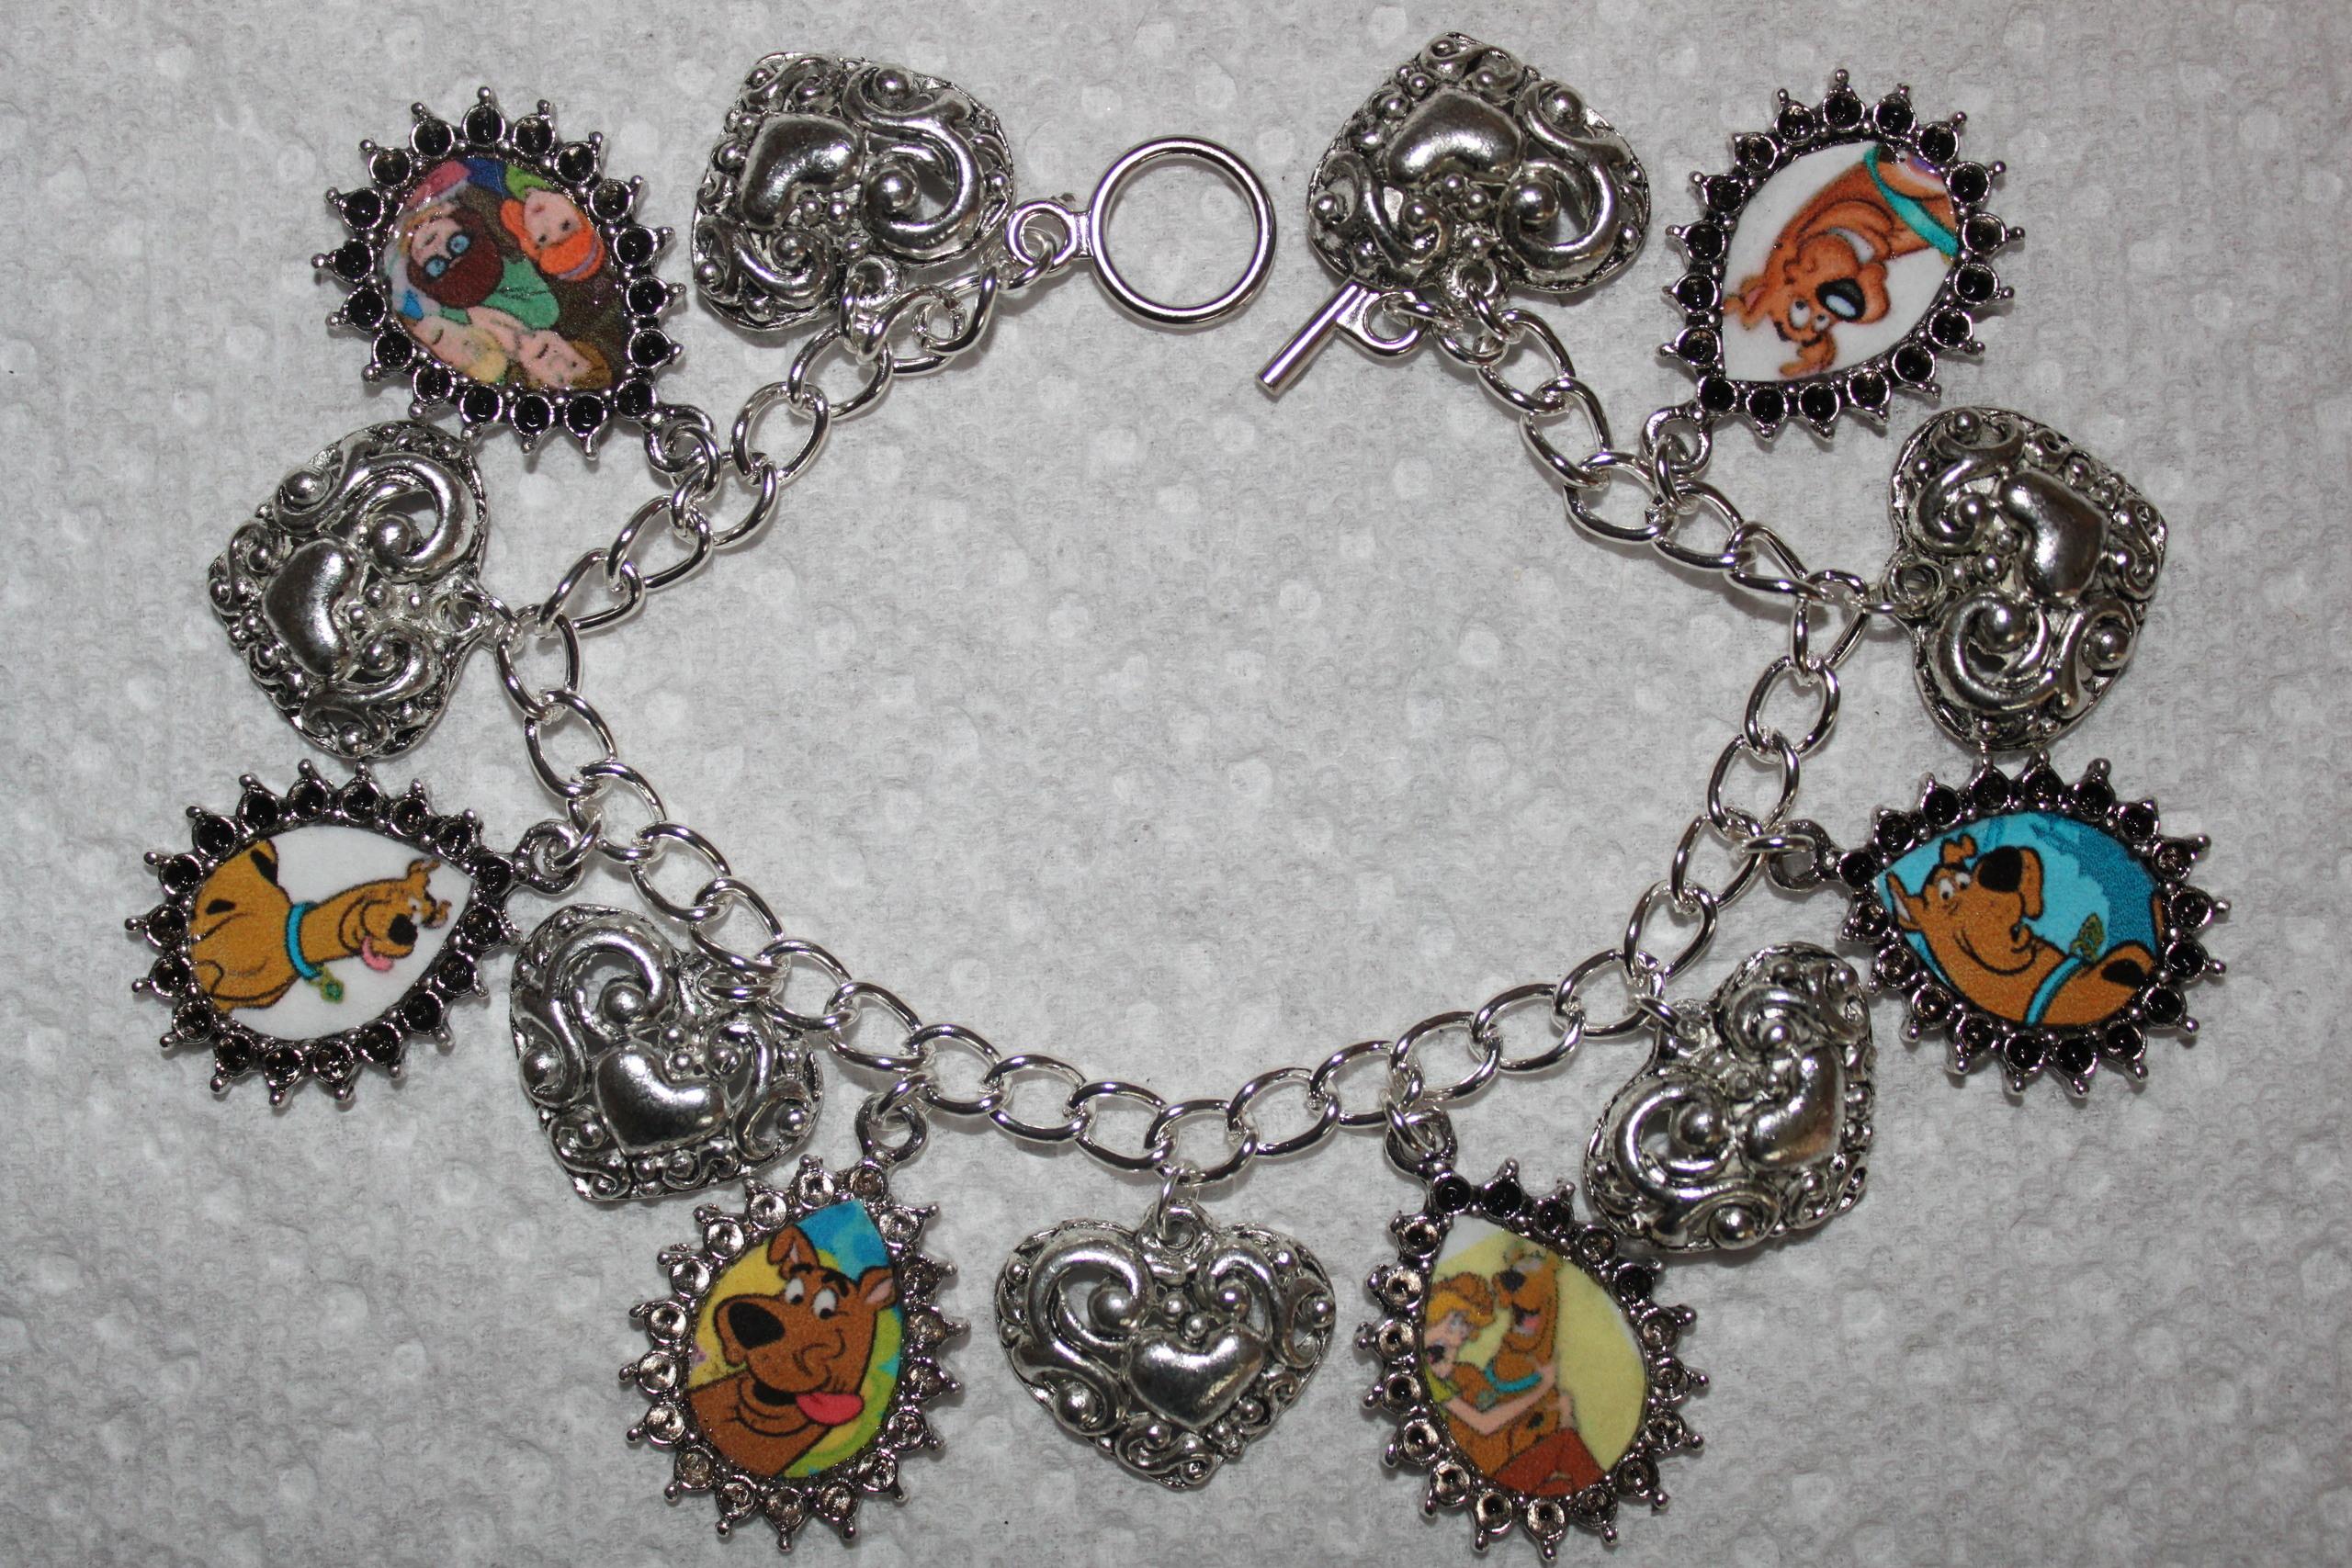 Scooby Doo Charm Bracelet